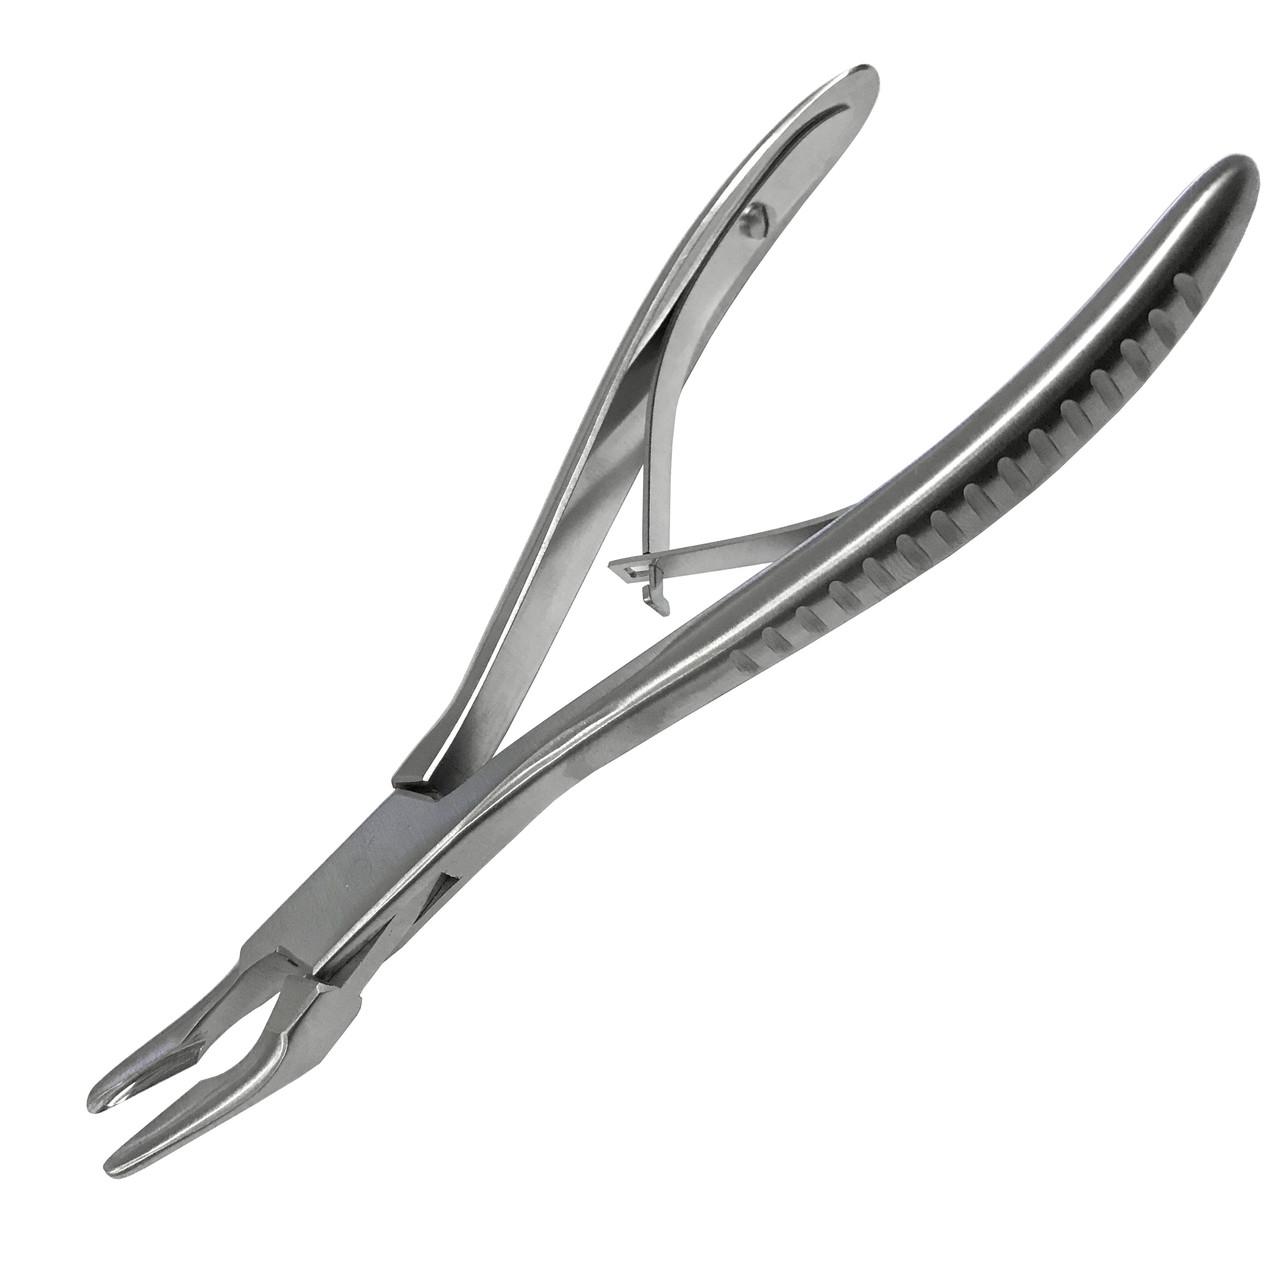 Щипцы кусачки костные изогнутые по Jansen. Размер 17 см х 4 мм SURGIWELOMED